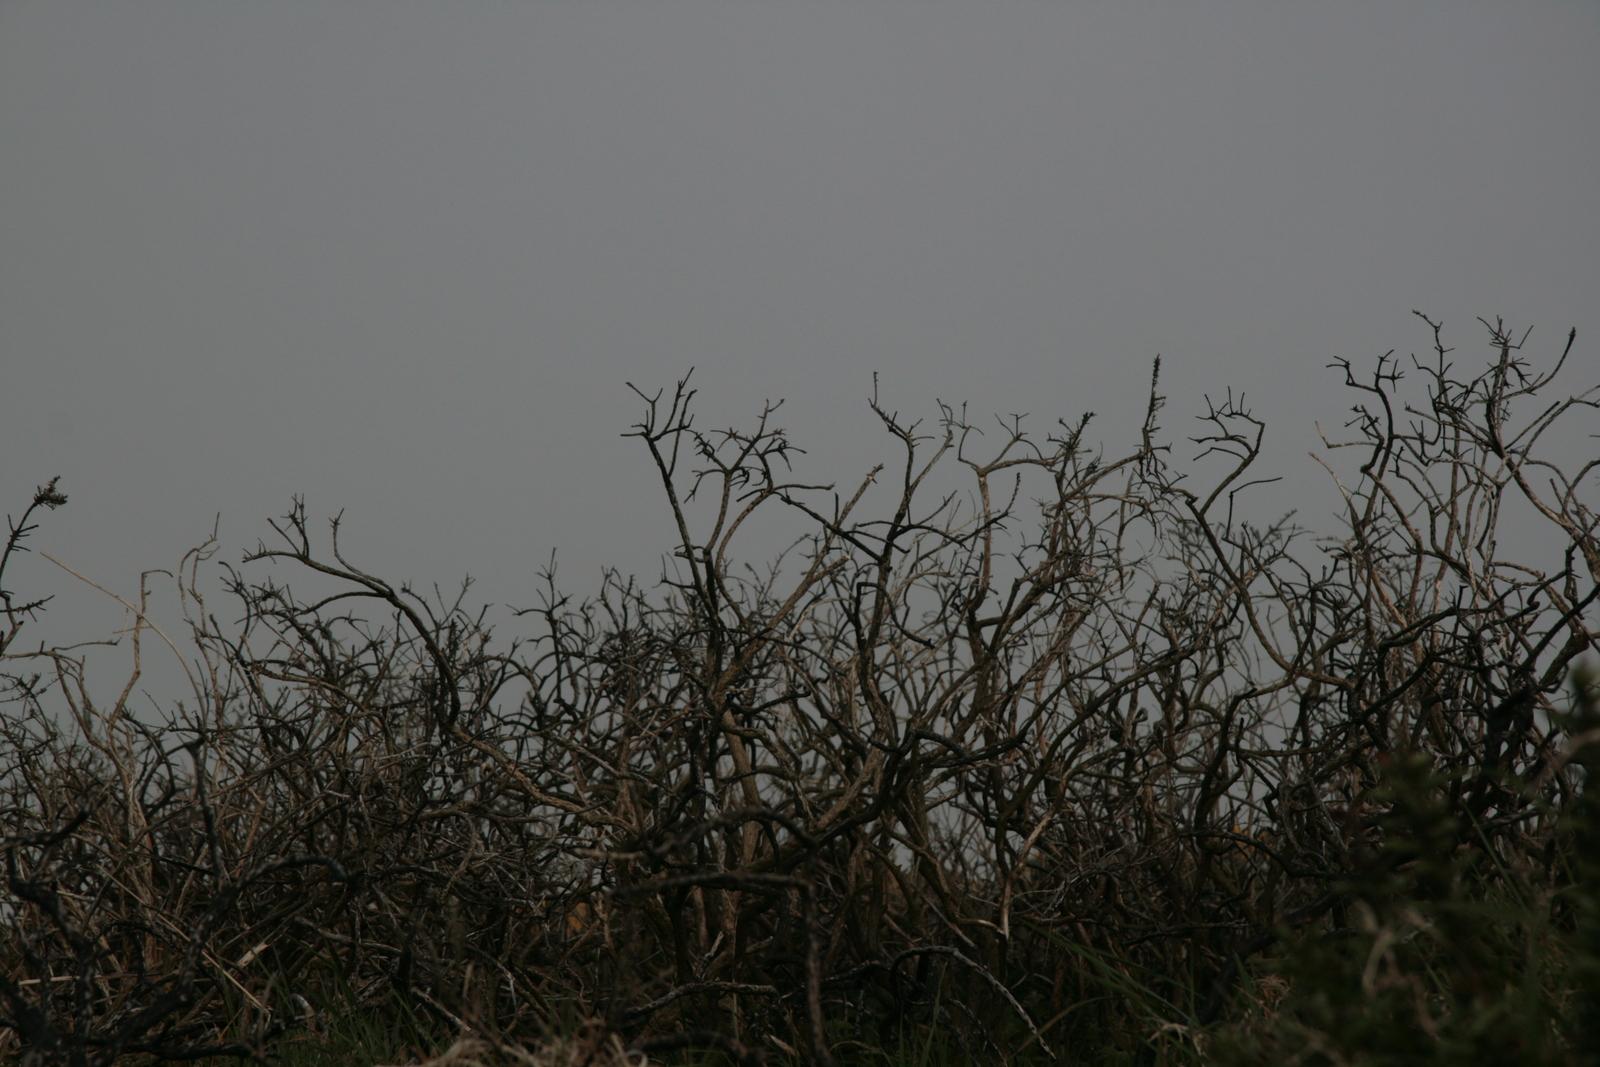 Dead Thorn Bushes 1